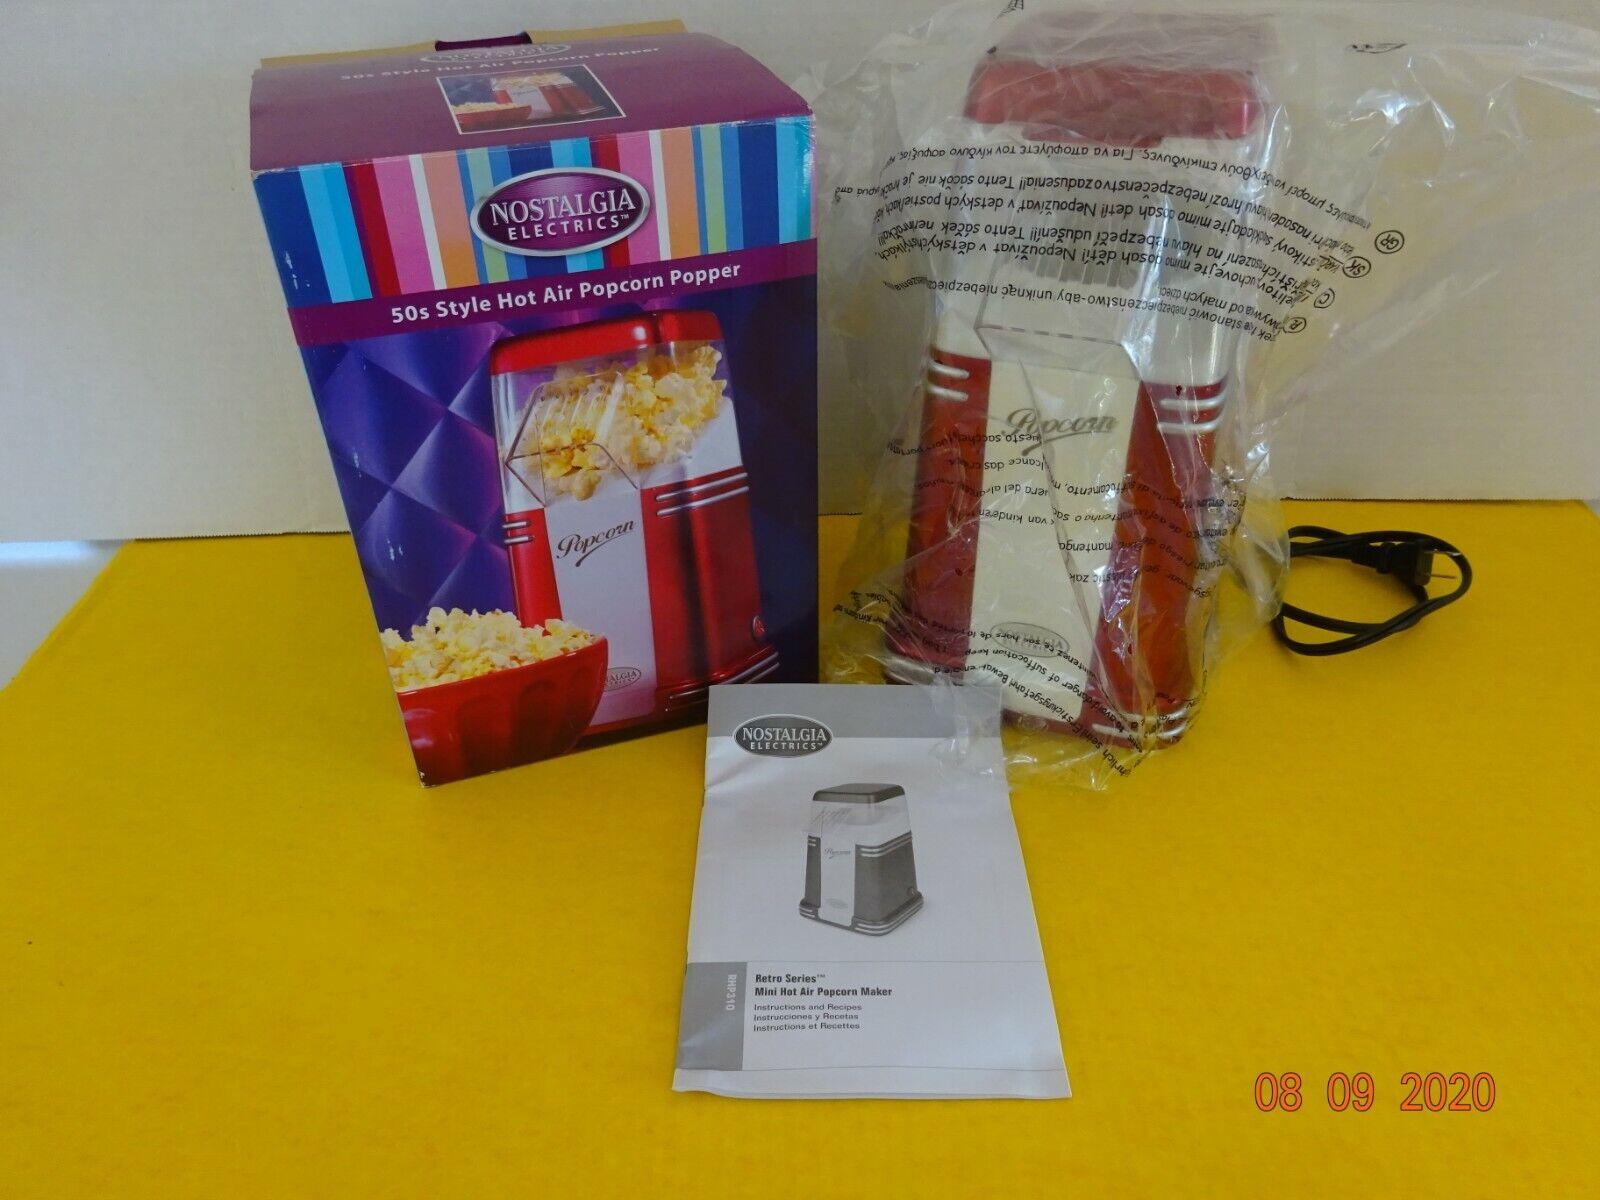 Nostalgia Retro Series 50's Style Mini Hot Popcorn Maker RHP